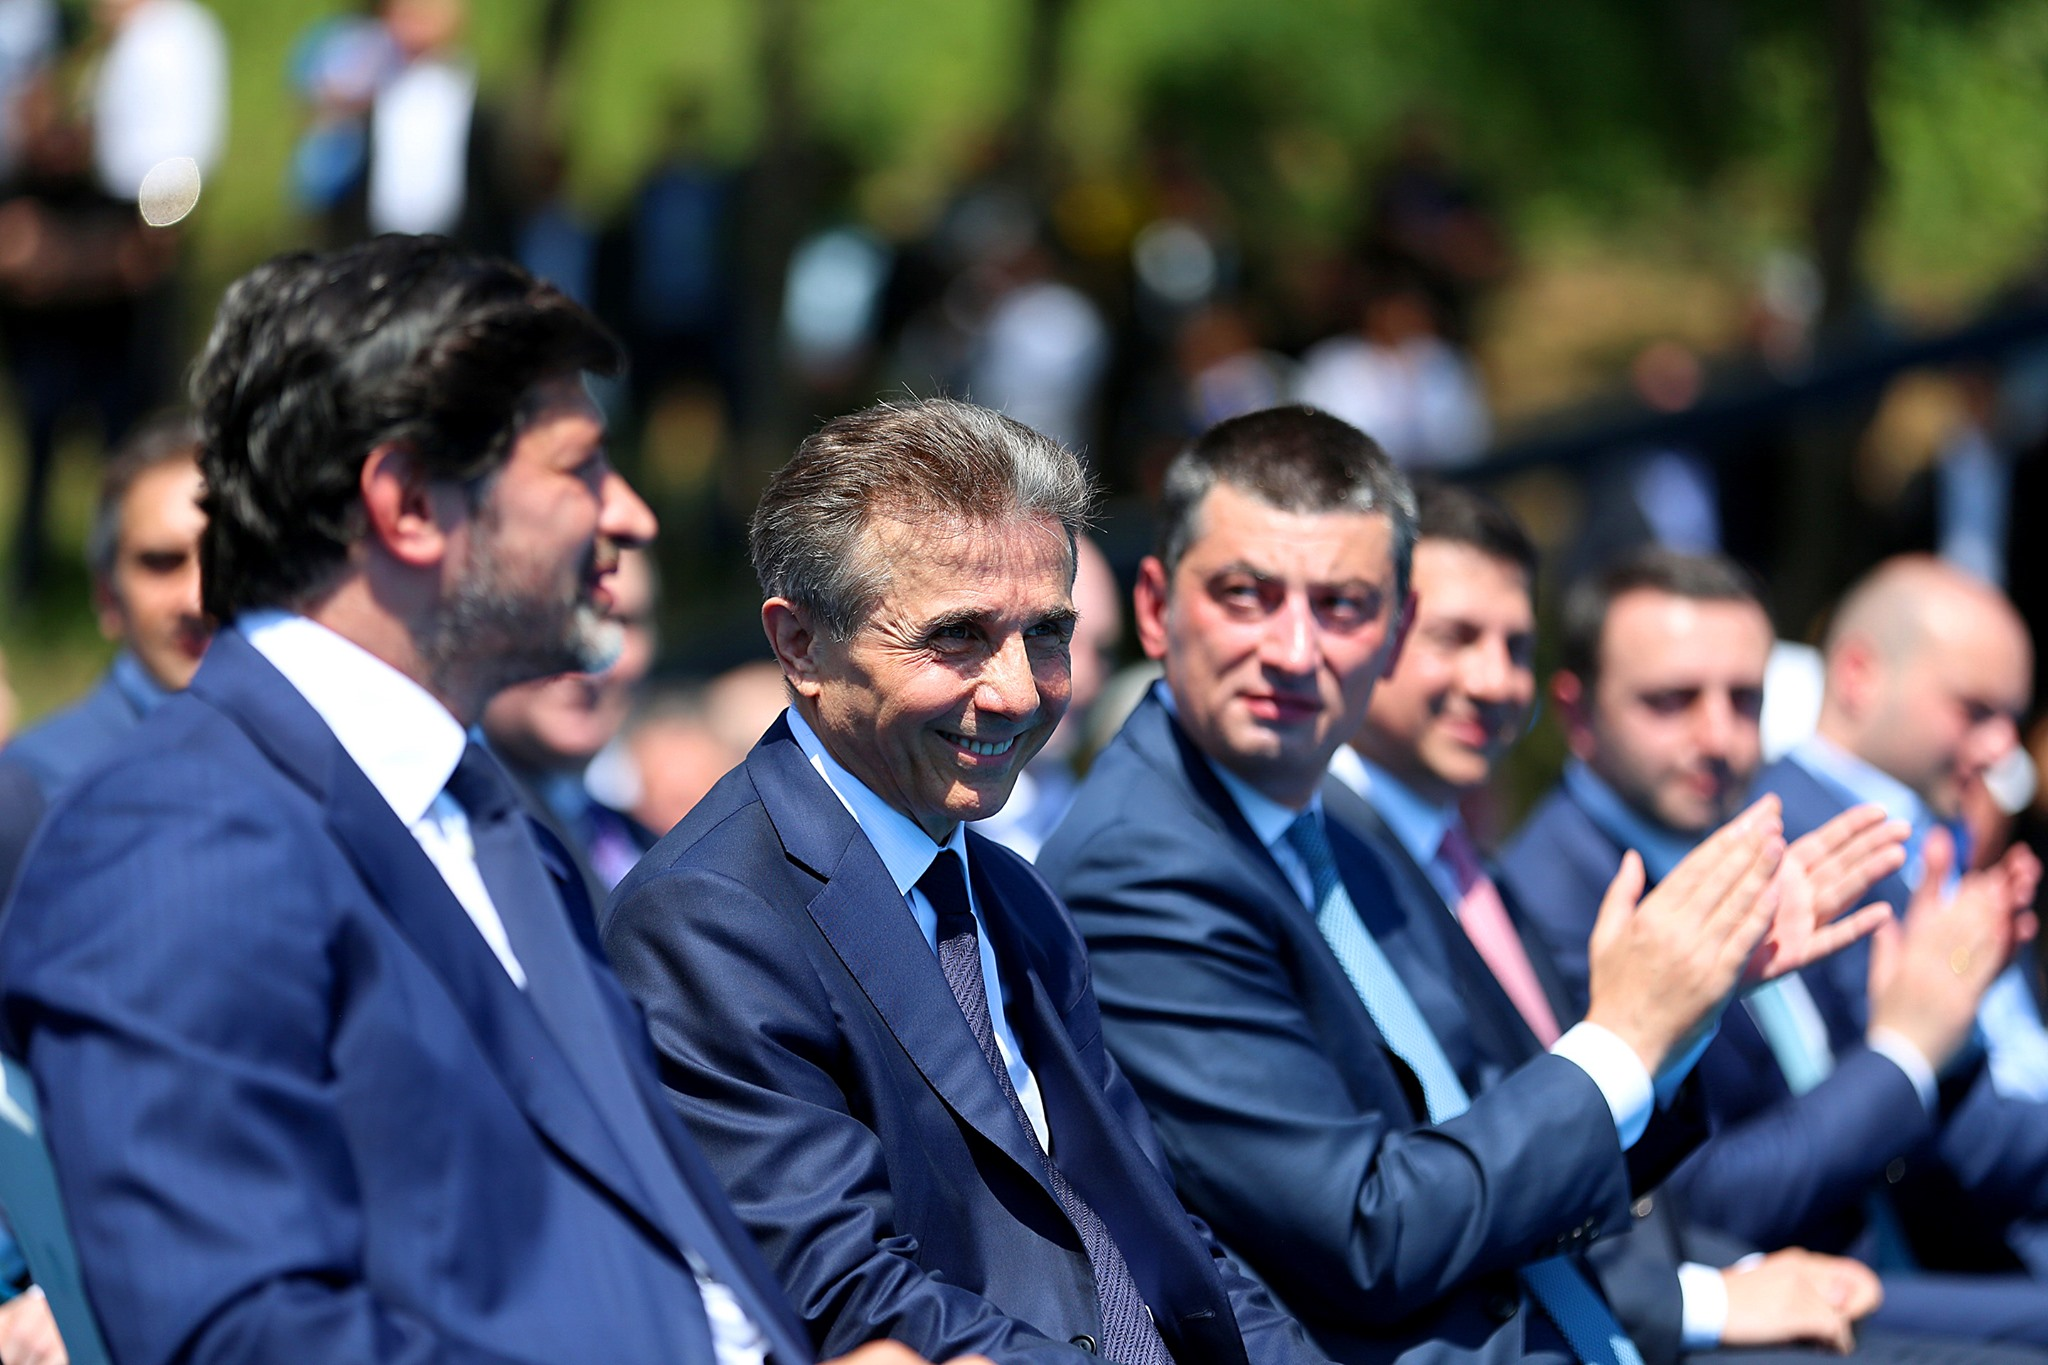 Kaladze Ivanishvili Gakharia #новости Георгий Гахария, Георгий Ходжеванишвили, Грузинская мечта